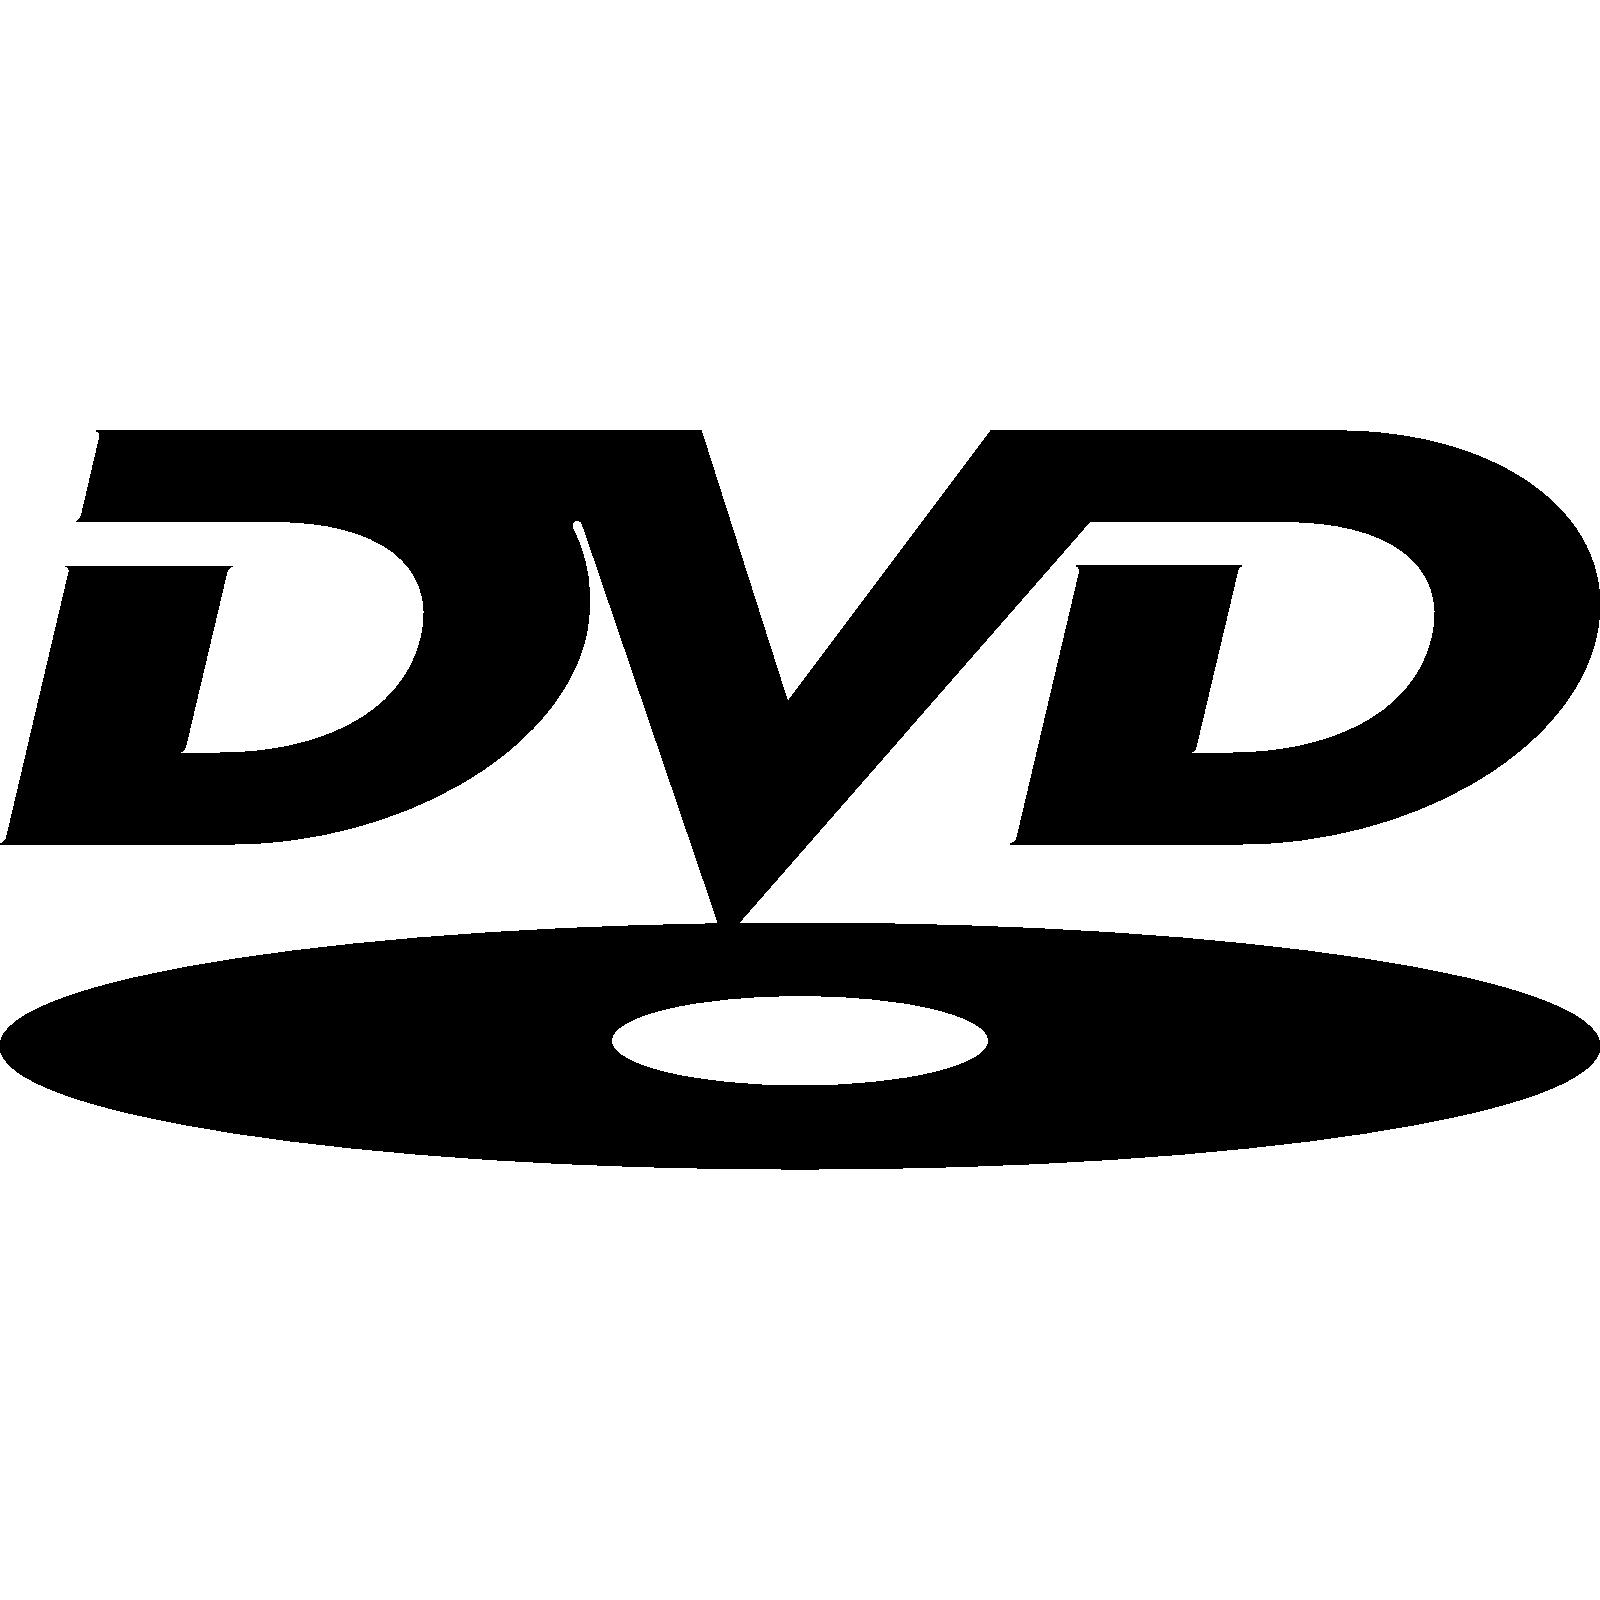 image dvd logopedia fandom powered by wikia. Black Bedroom Furniture Sets. Home Design Ideas